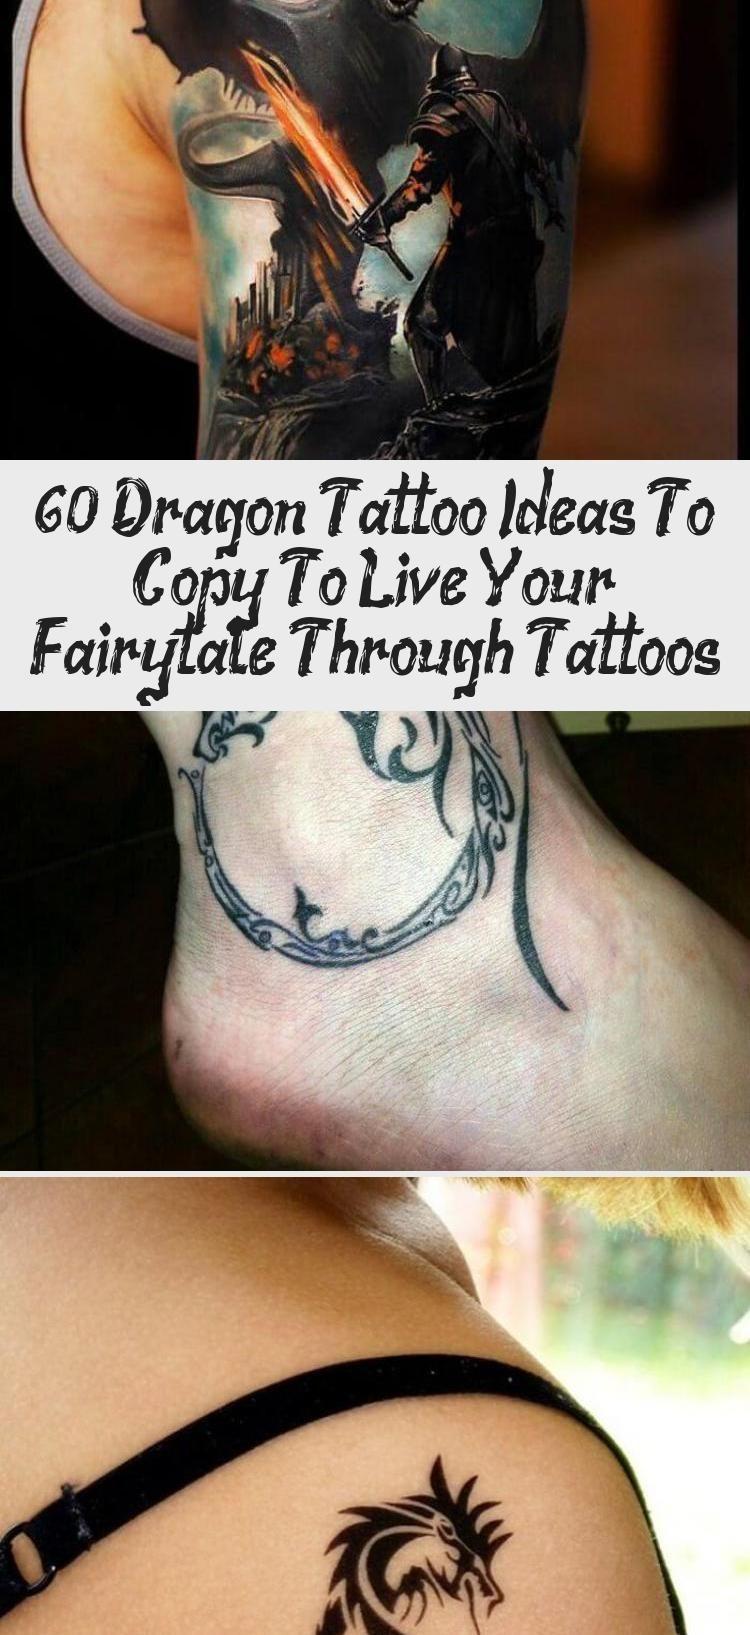 60 Dragon Tattoo Ideas To Copy To Live Your Fairytale Through Tattoos  Tattoos